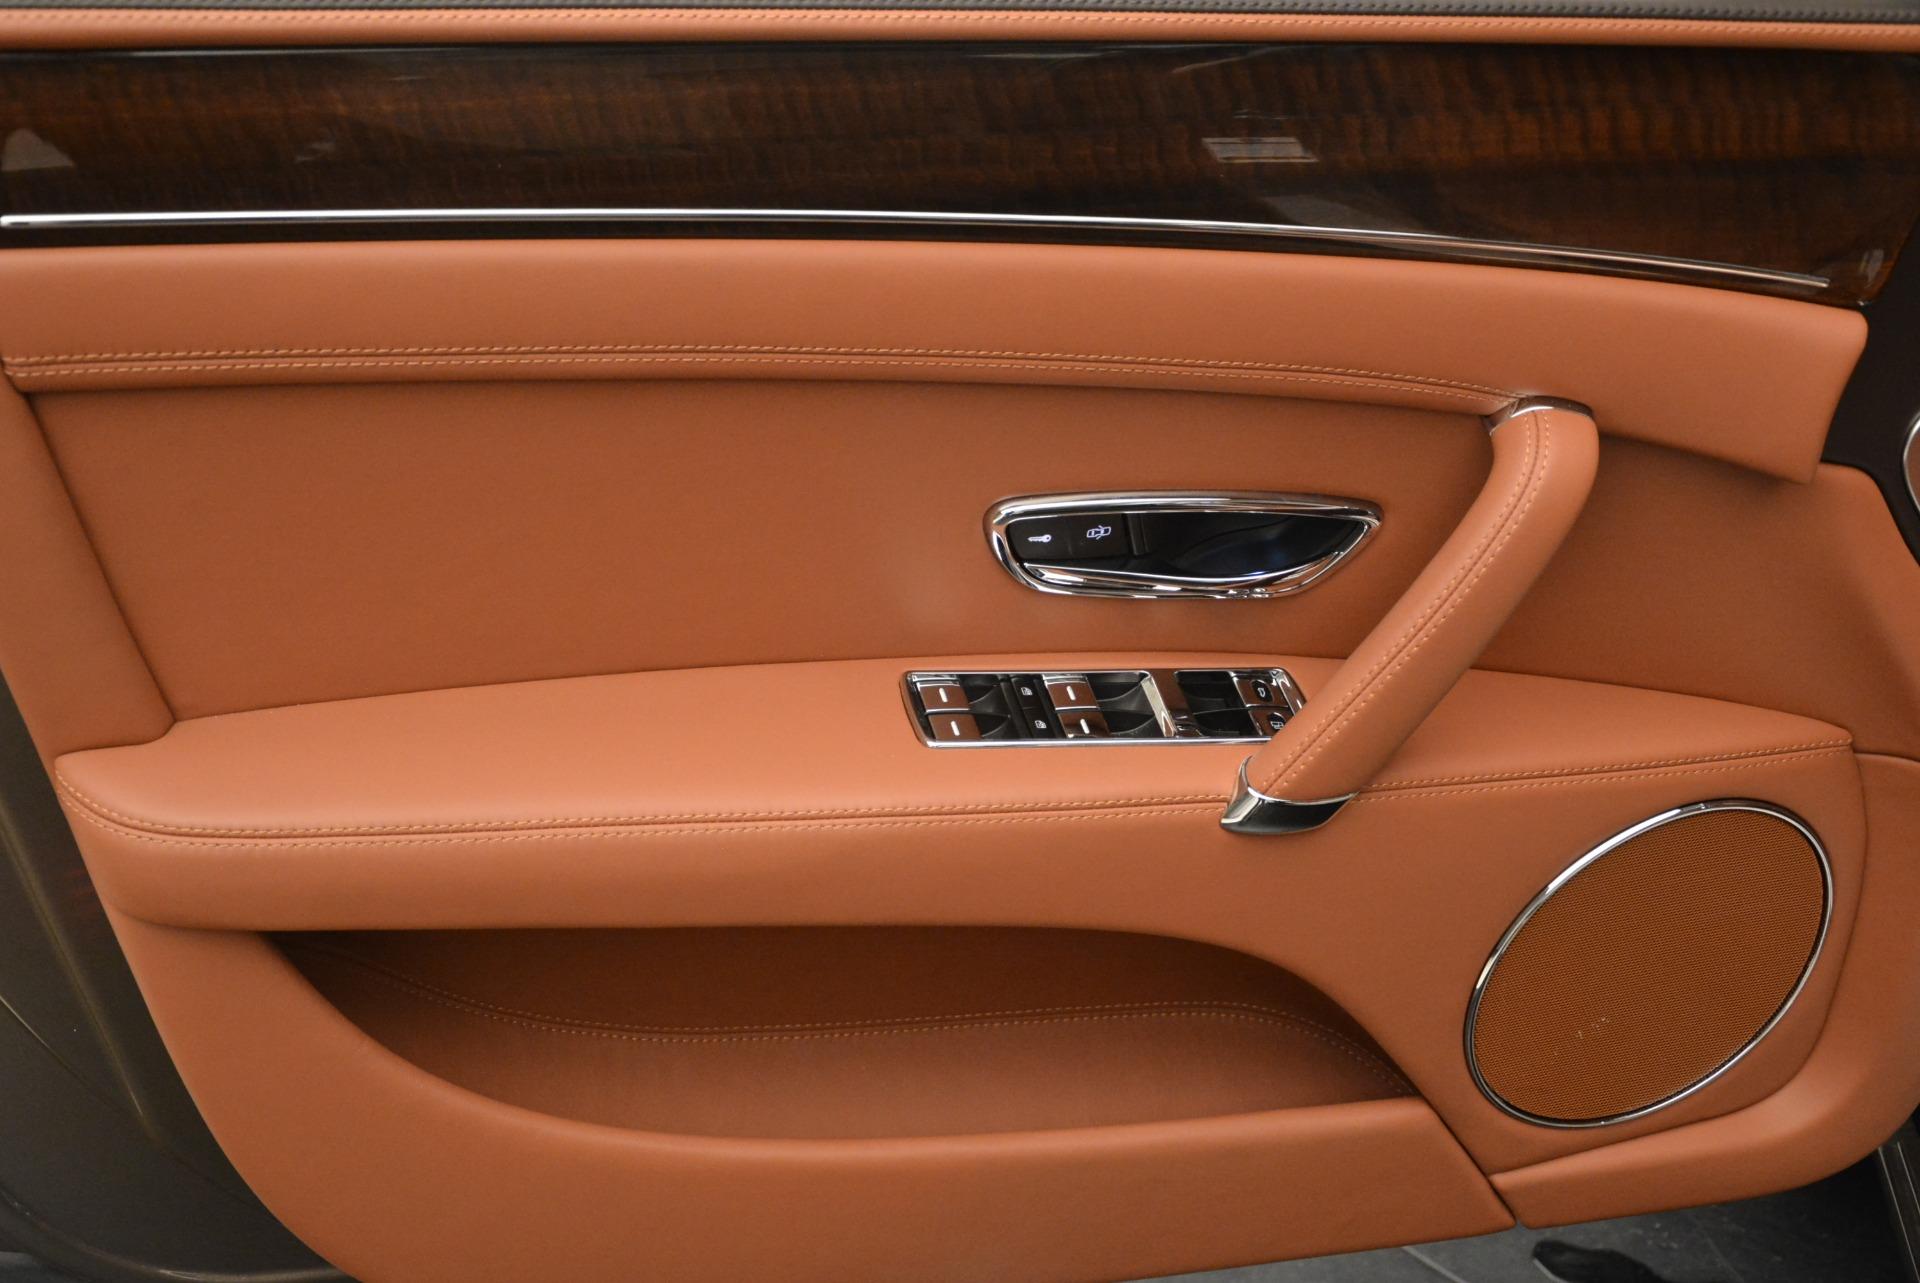 Used 2015 Bentley Flying Spur W12 For Sale In Westport, CT 2266_p19